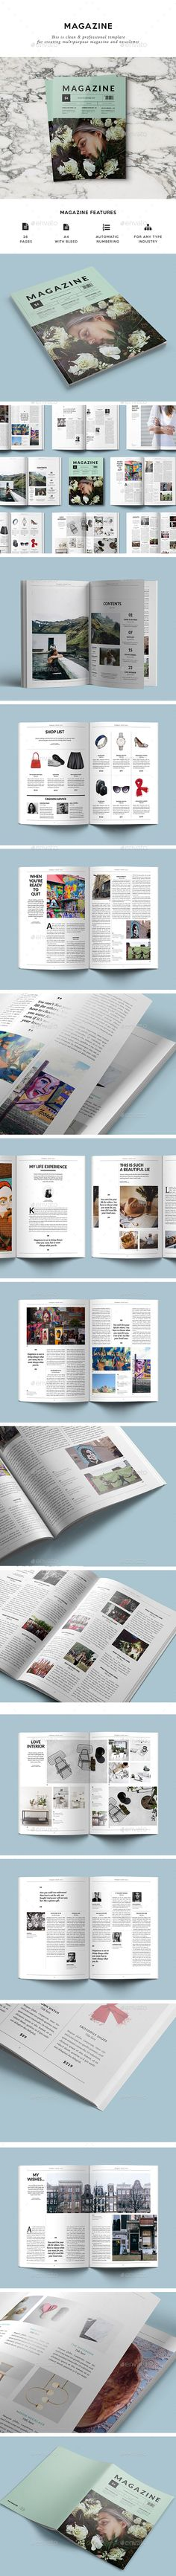 Magazine Template InDesign INDD. Download here: https://graphicriver.net/item/magazine-template/17559609?ref=ksioks